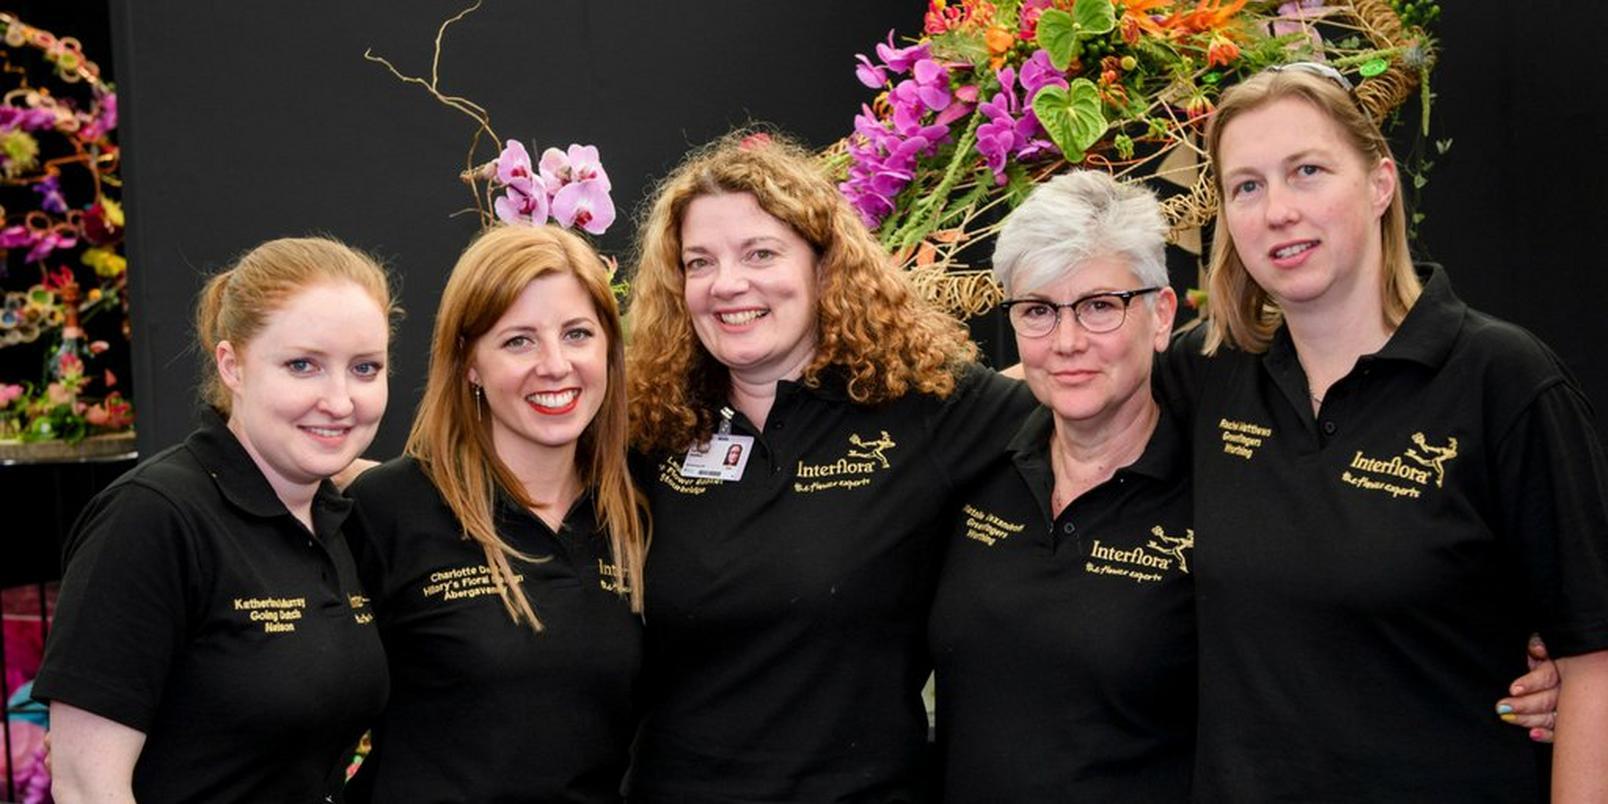 laura-leong-crowned-interflora-florist-year-2018-7